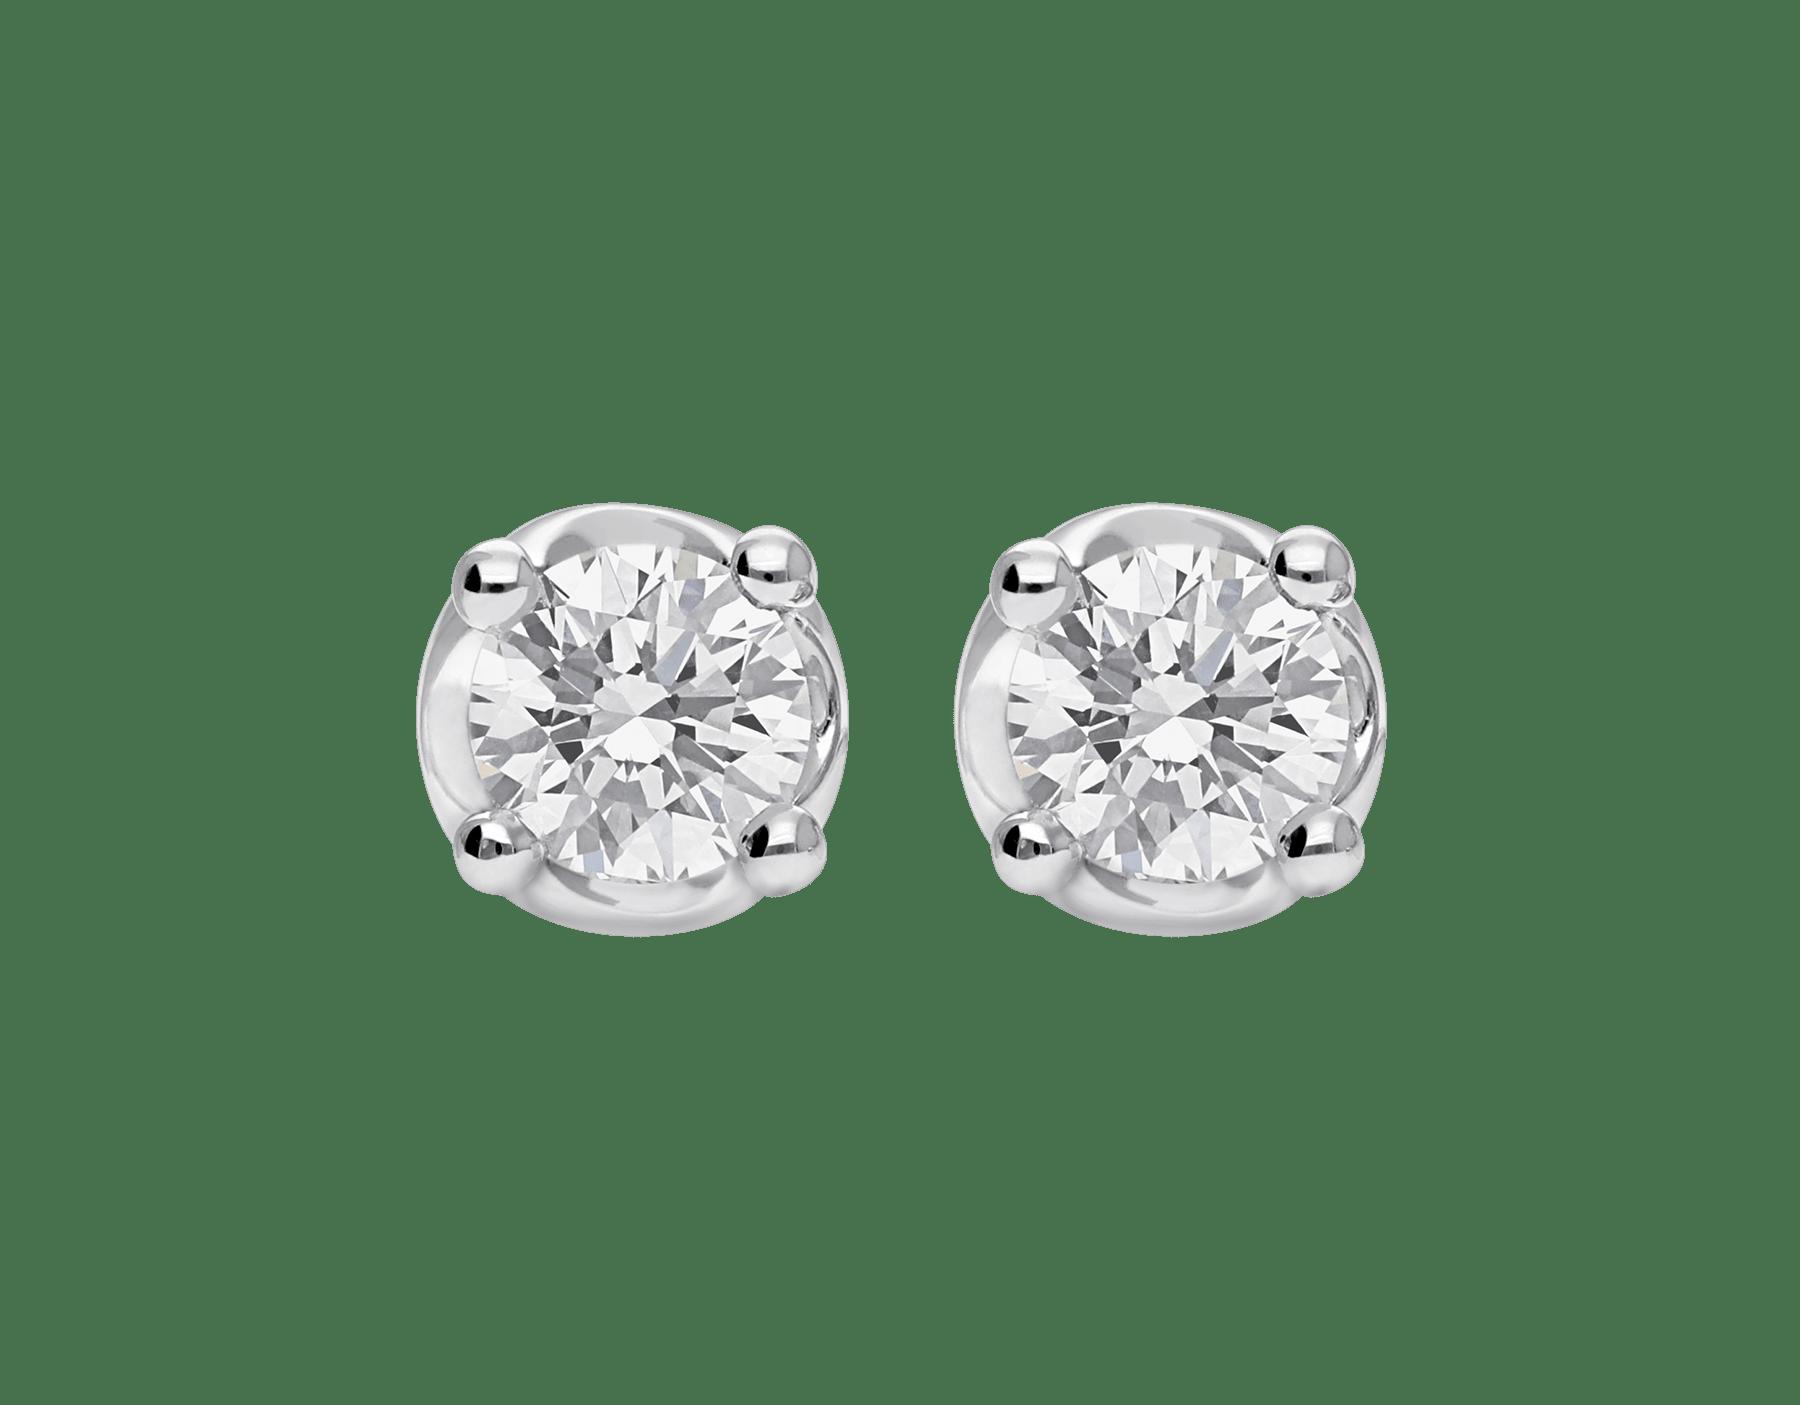 Corona 18 kt white gold earrings set with round brilliant cut diamonds OR-CORONA image 1